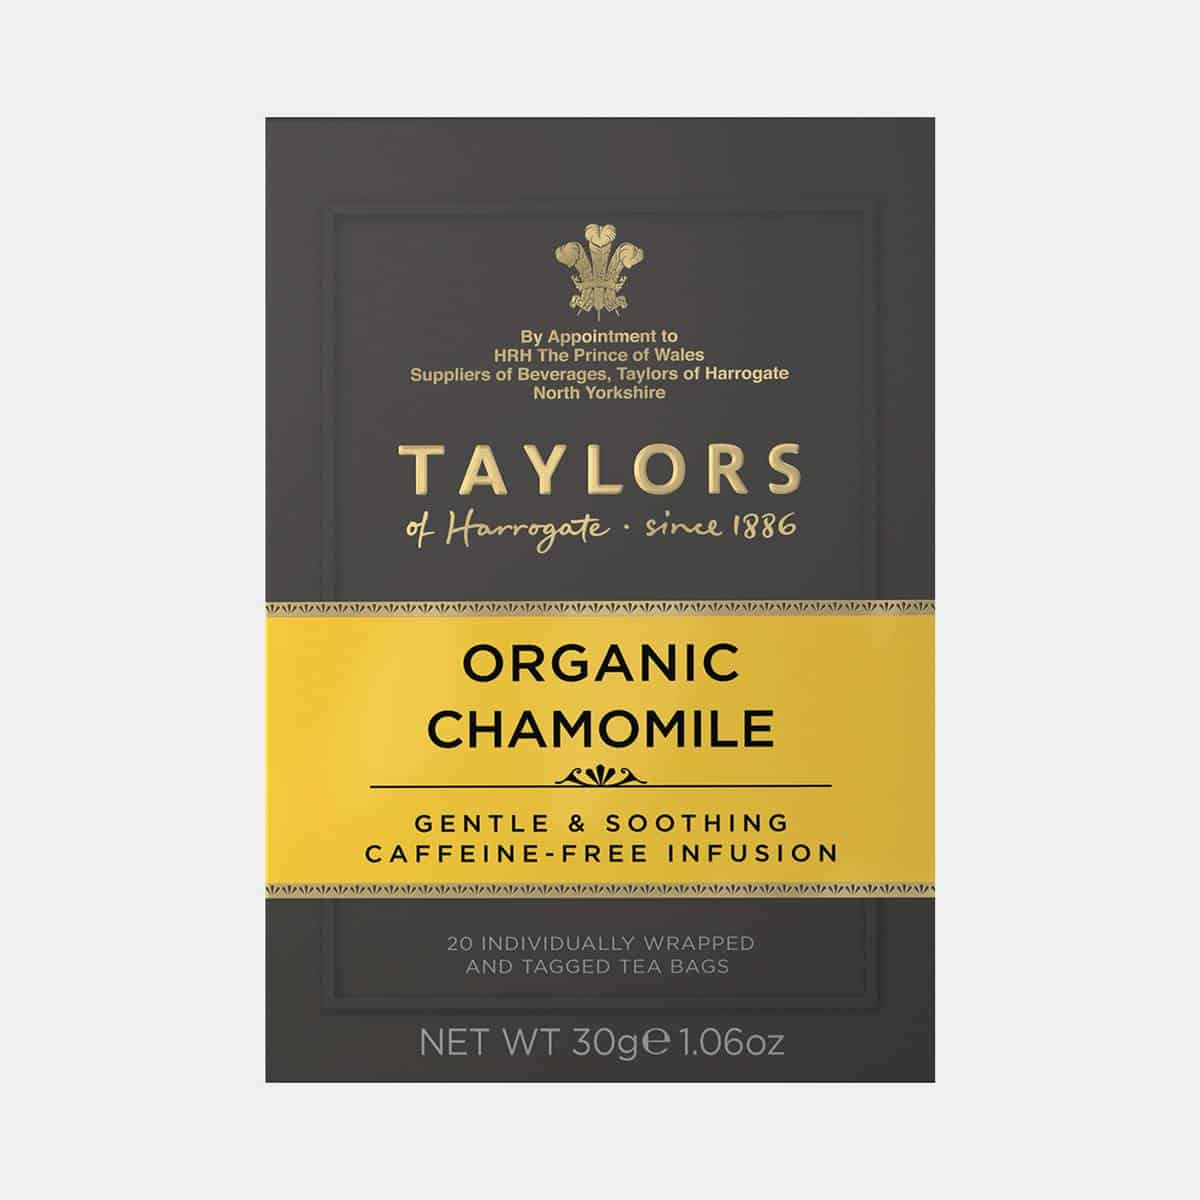 Taylors of Harrogate Organic Chamomile Tea 20s Pack